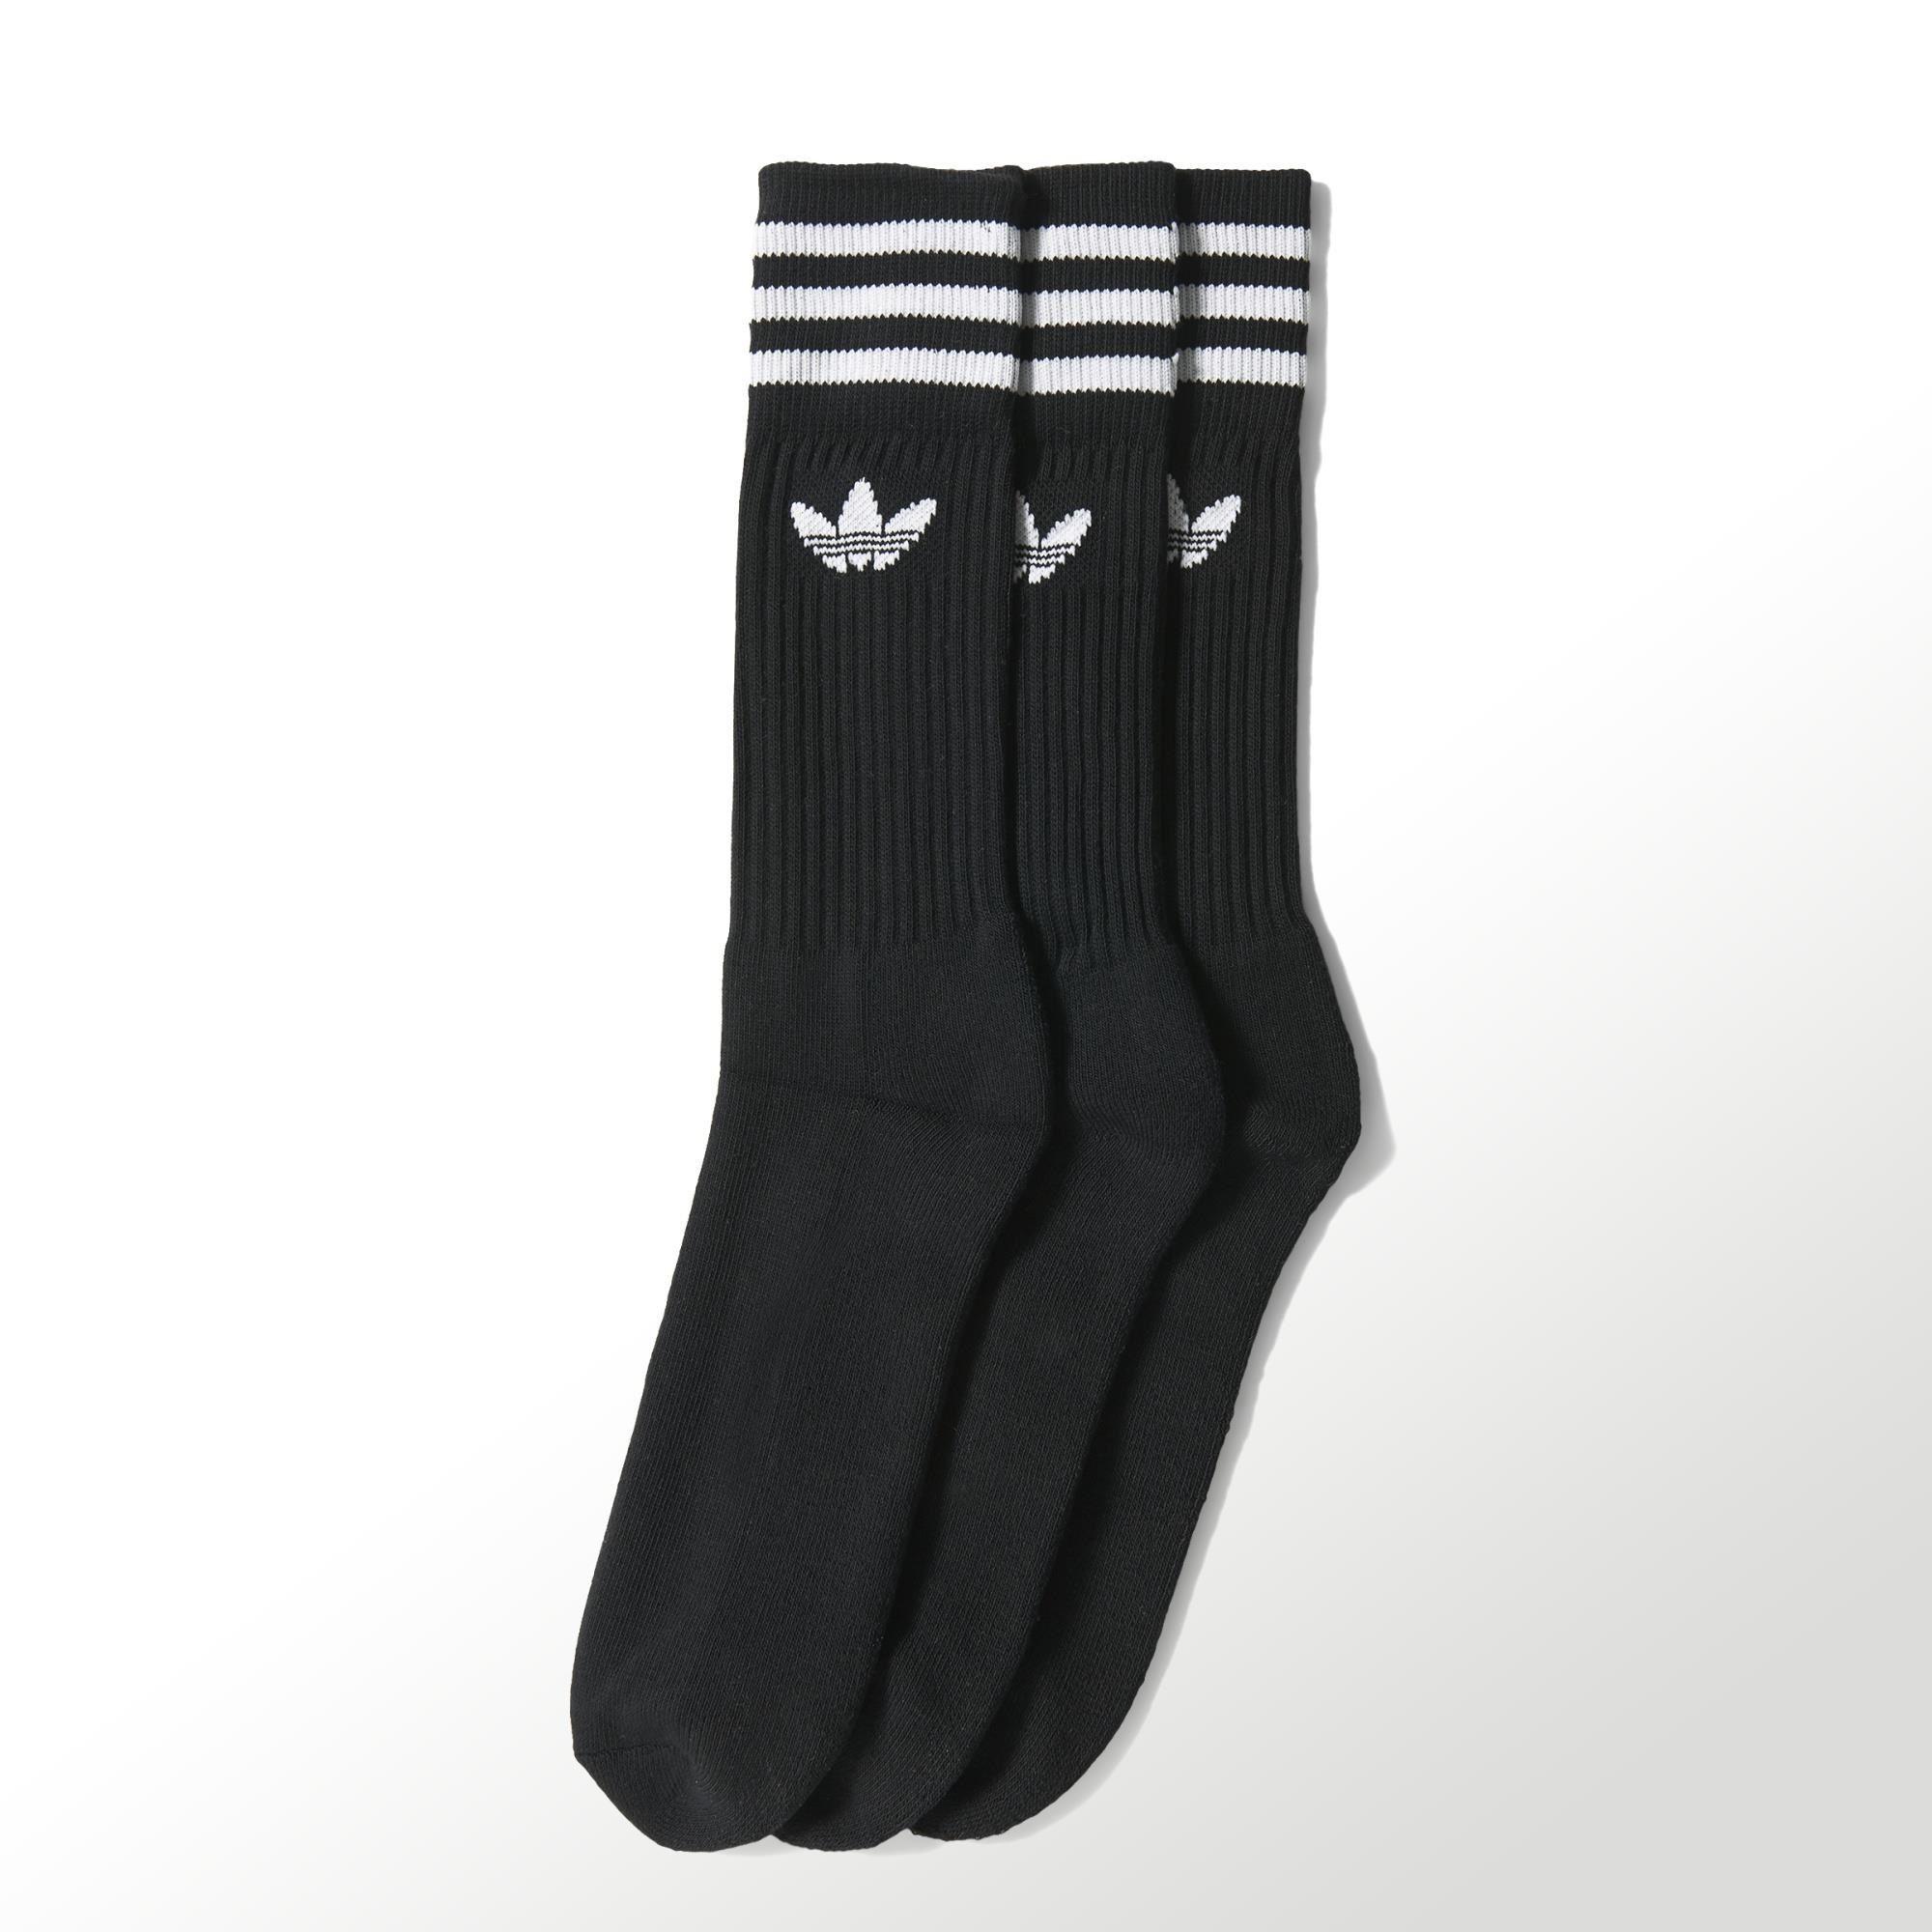 Access Denied Black Adidas Socks Adidas Slides Outfit Adidas Socks